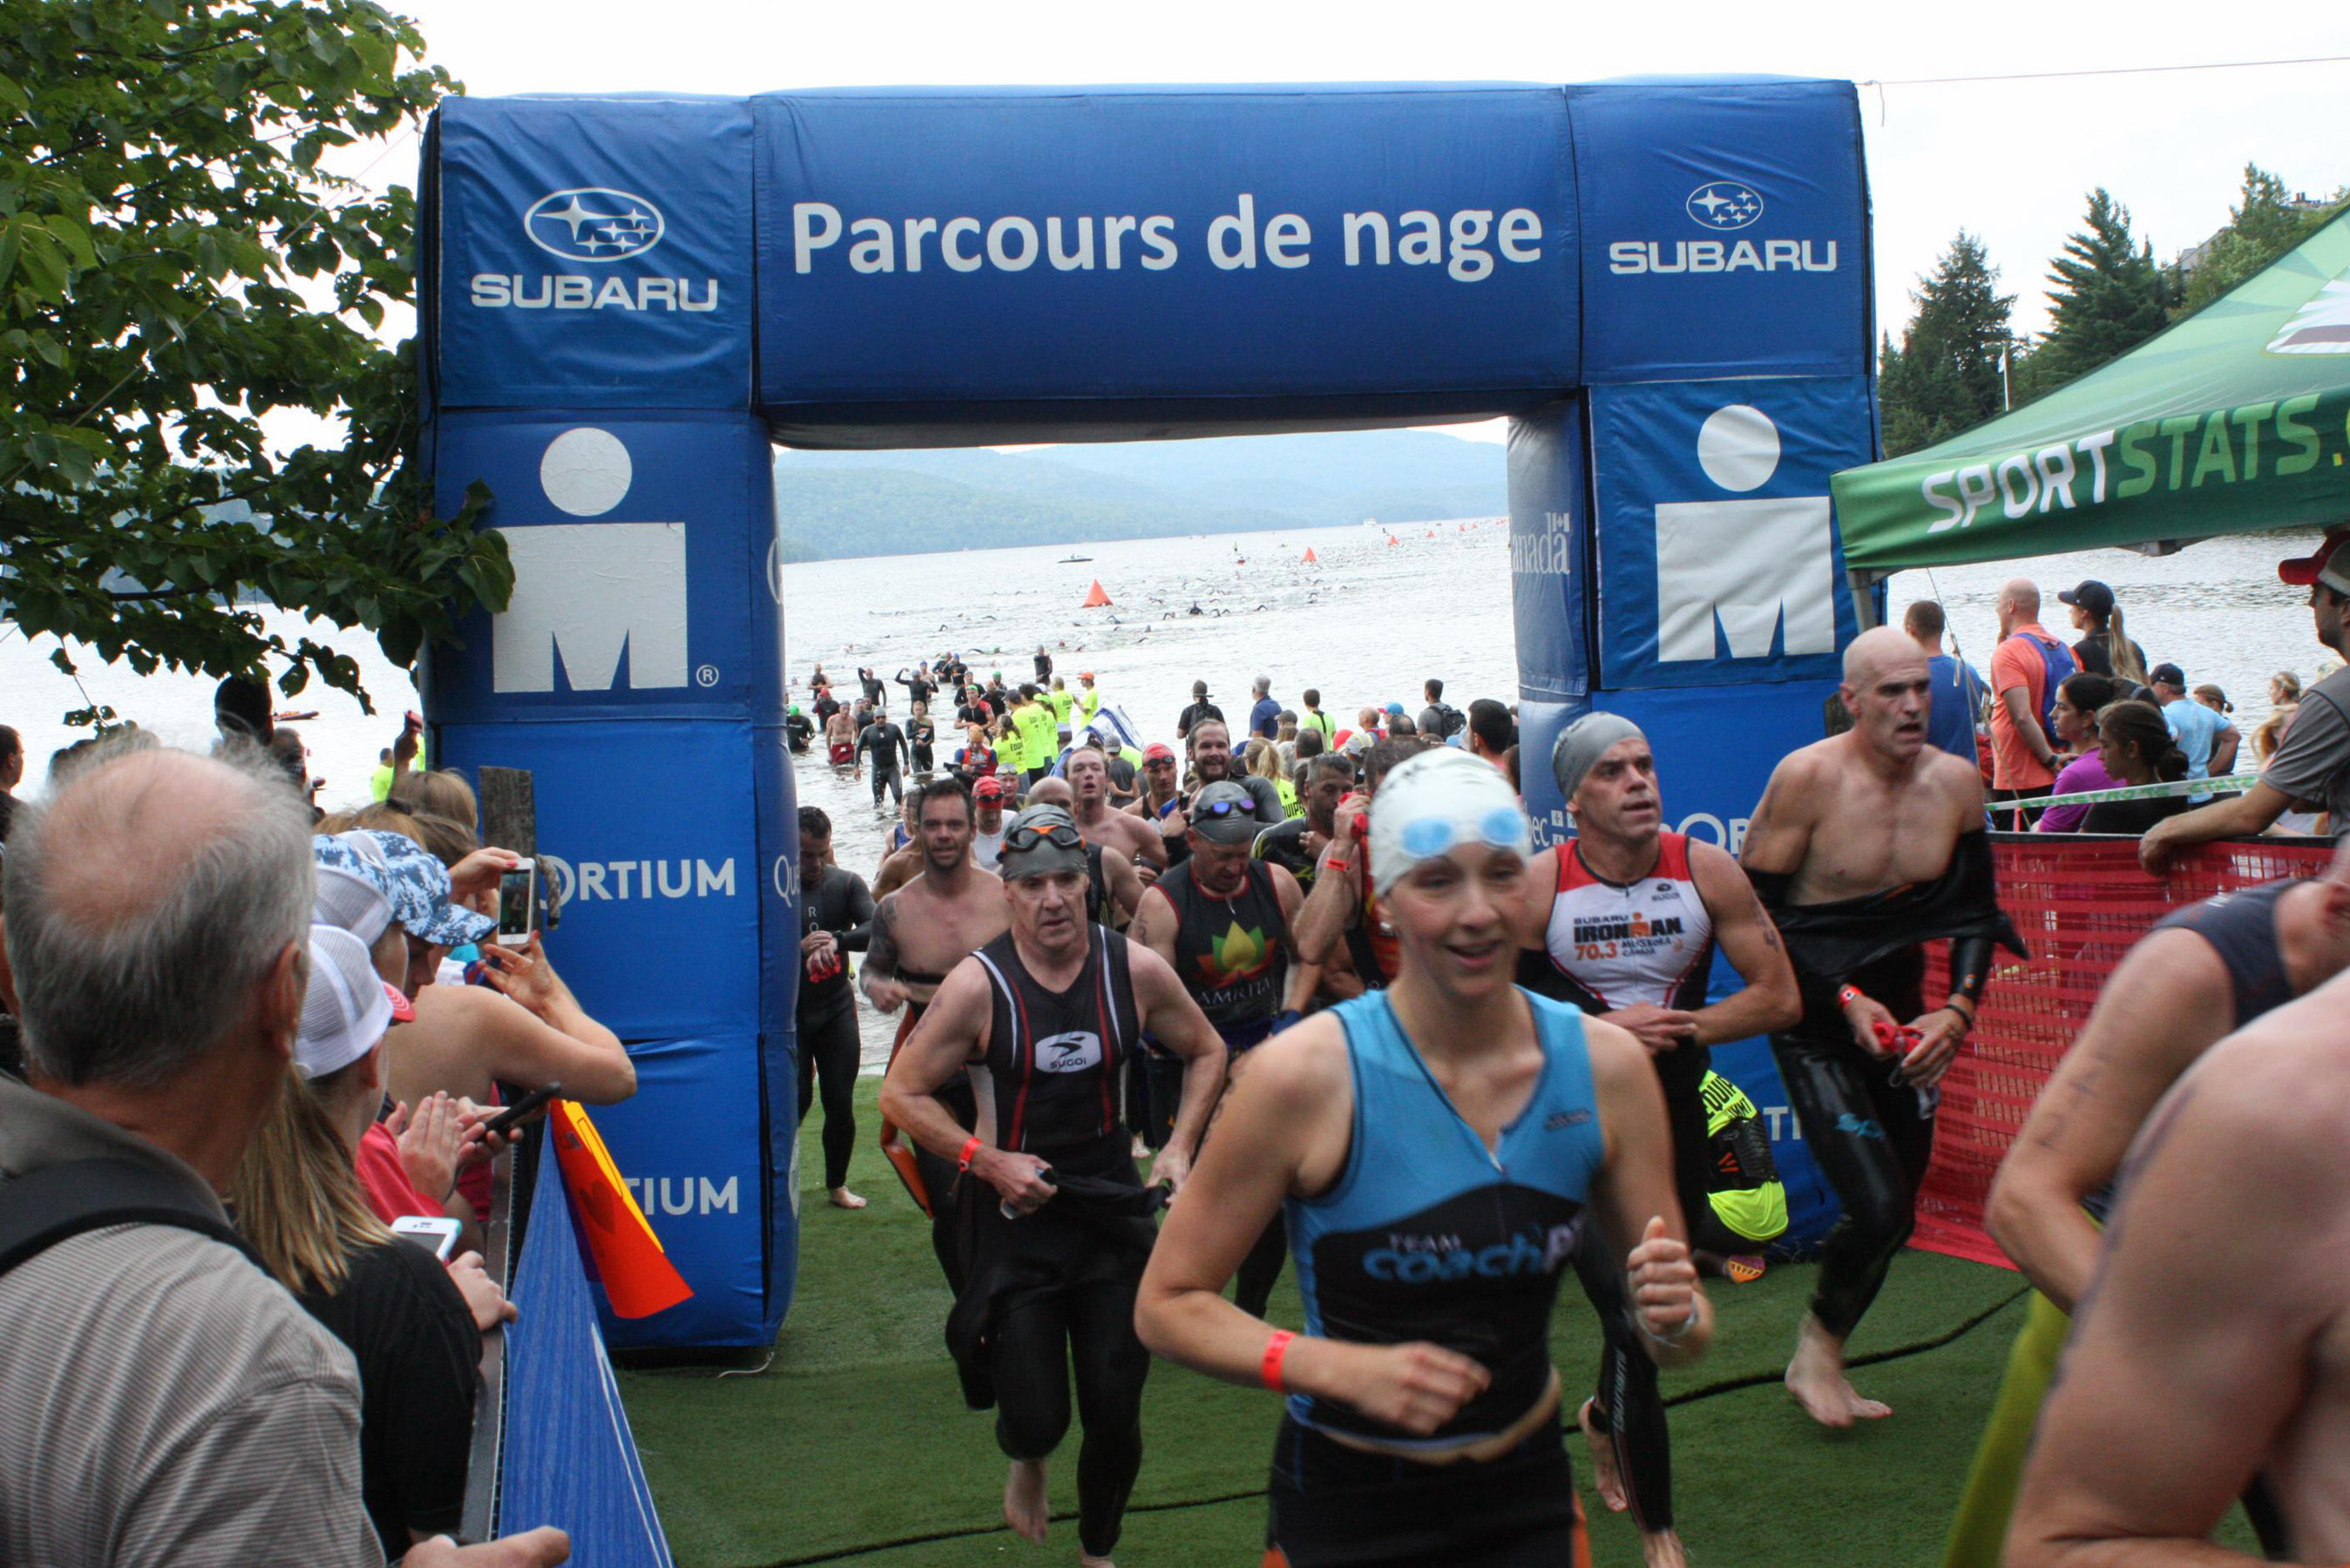 Ironman Mont-Tremblant 2016 - Swim exit. Only swim picture I got.